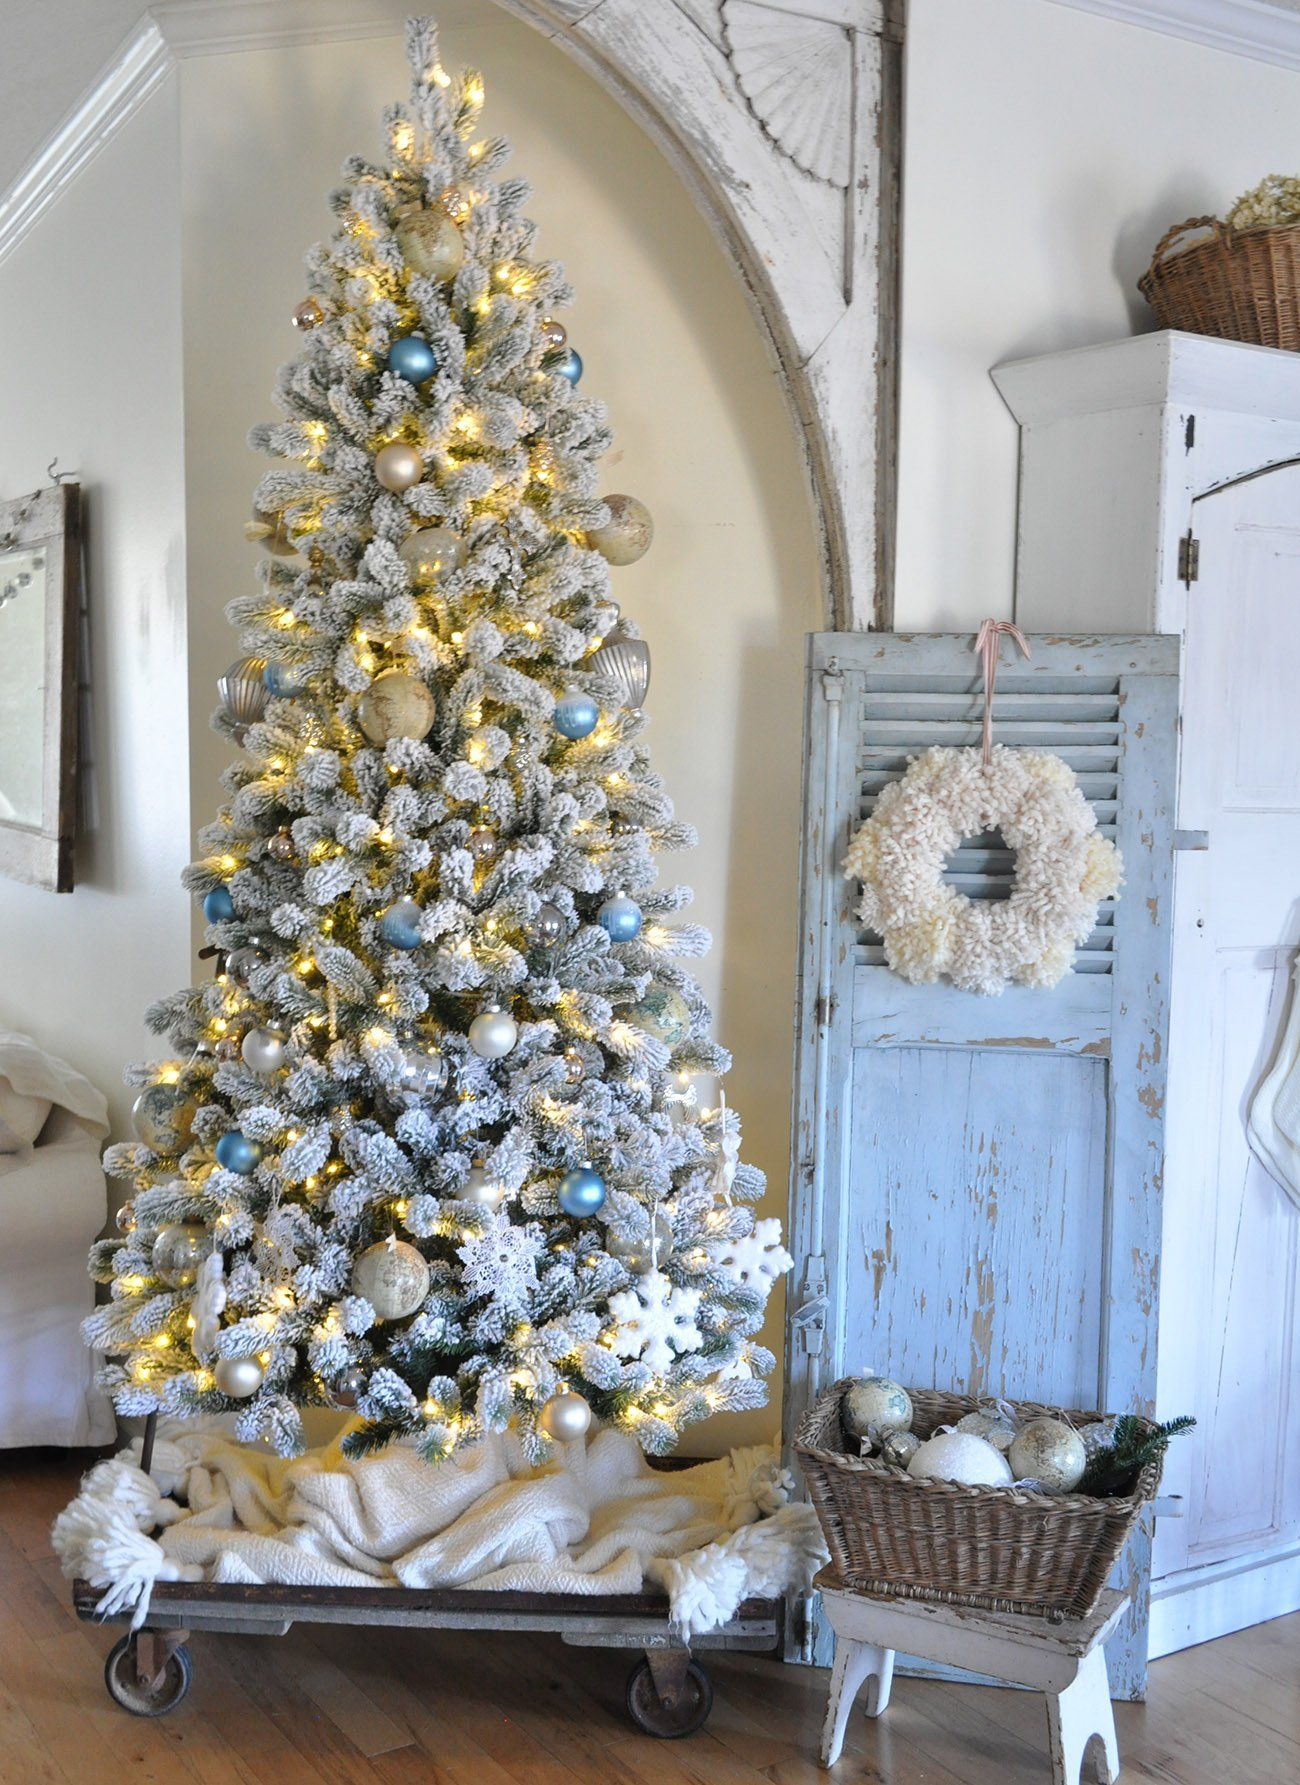 9 Foot King Flock Slim Artificial Christmas Tree 700 Led Lights King Of Christ Blue Christmas Decor Slim Artificial Christmas Trees Artificial Christmas Tree